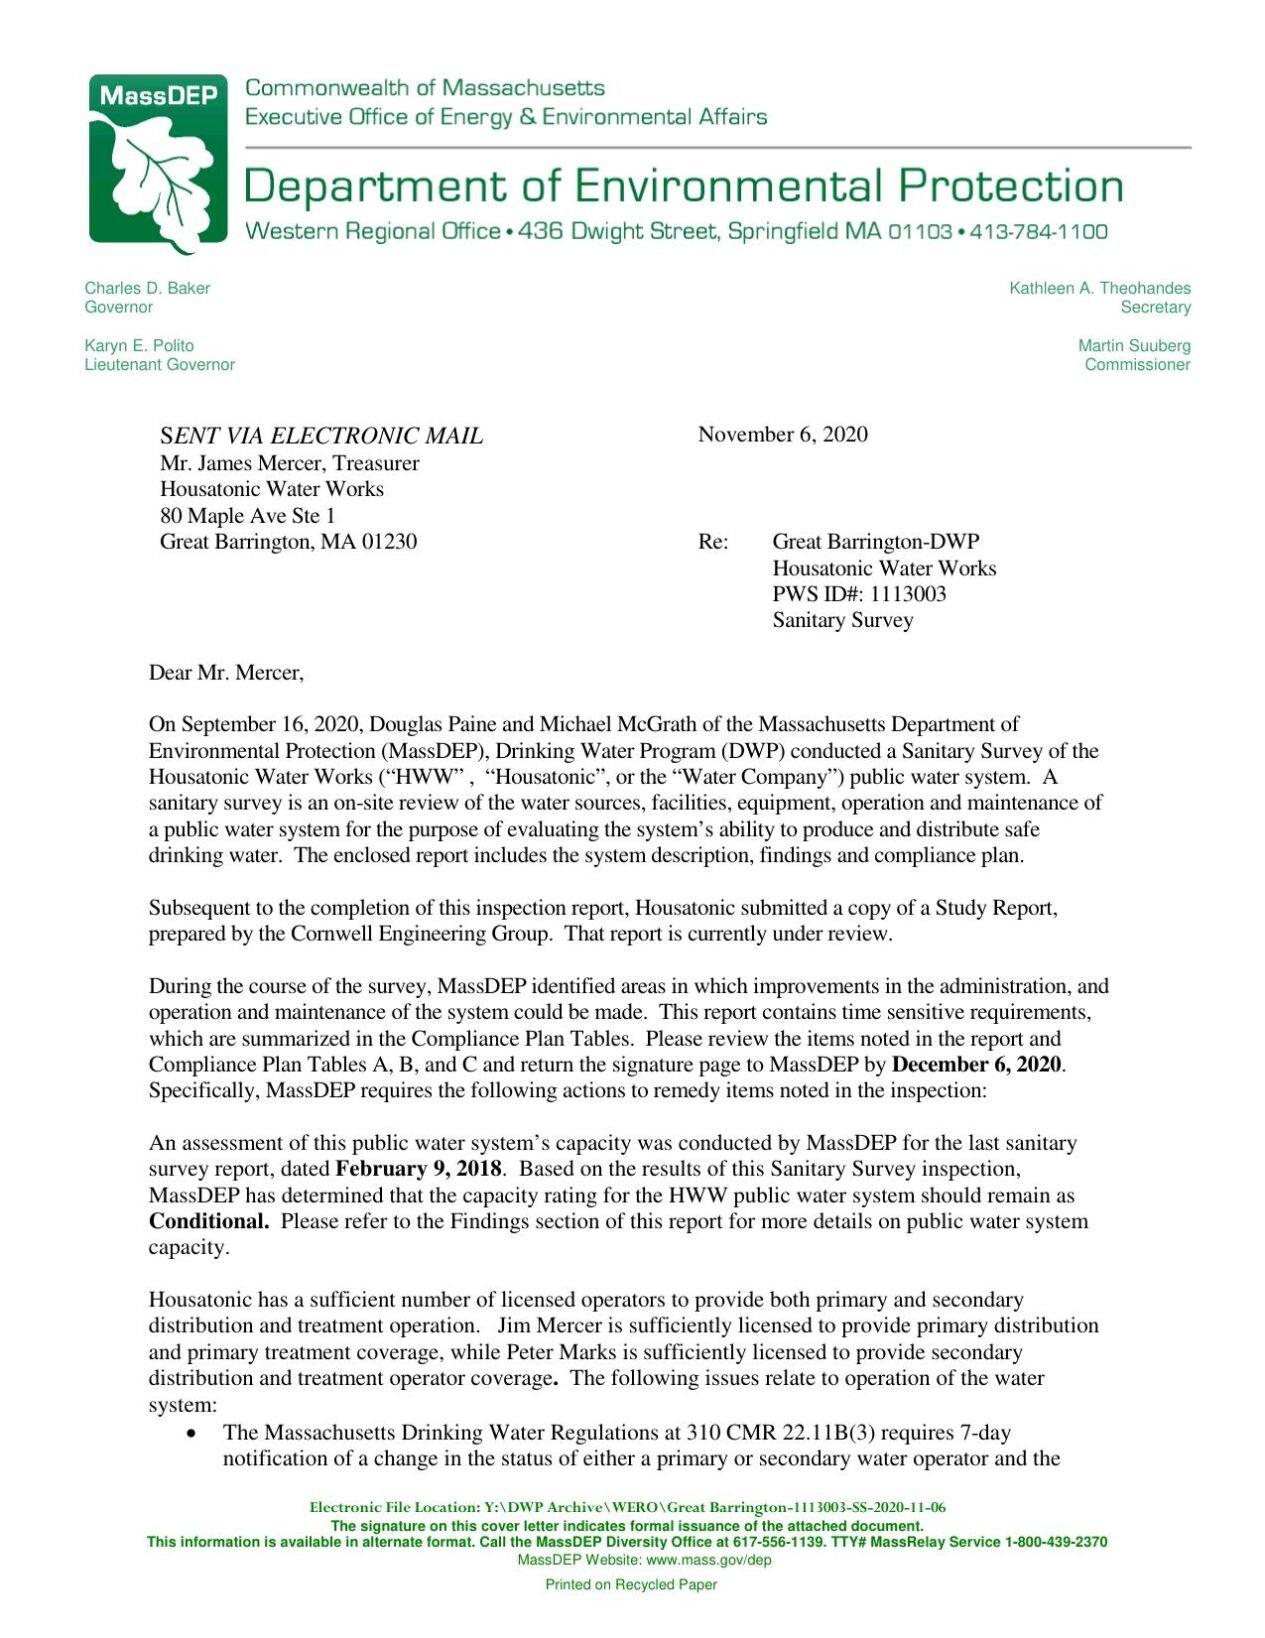 MassDEP Housatonic Water Works letter